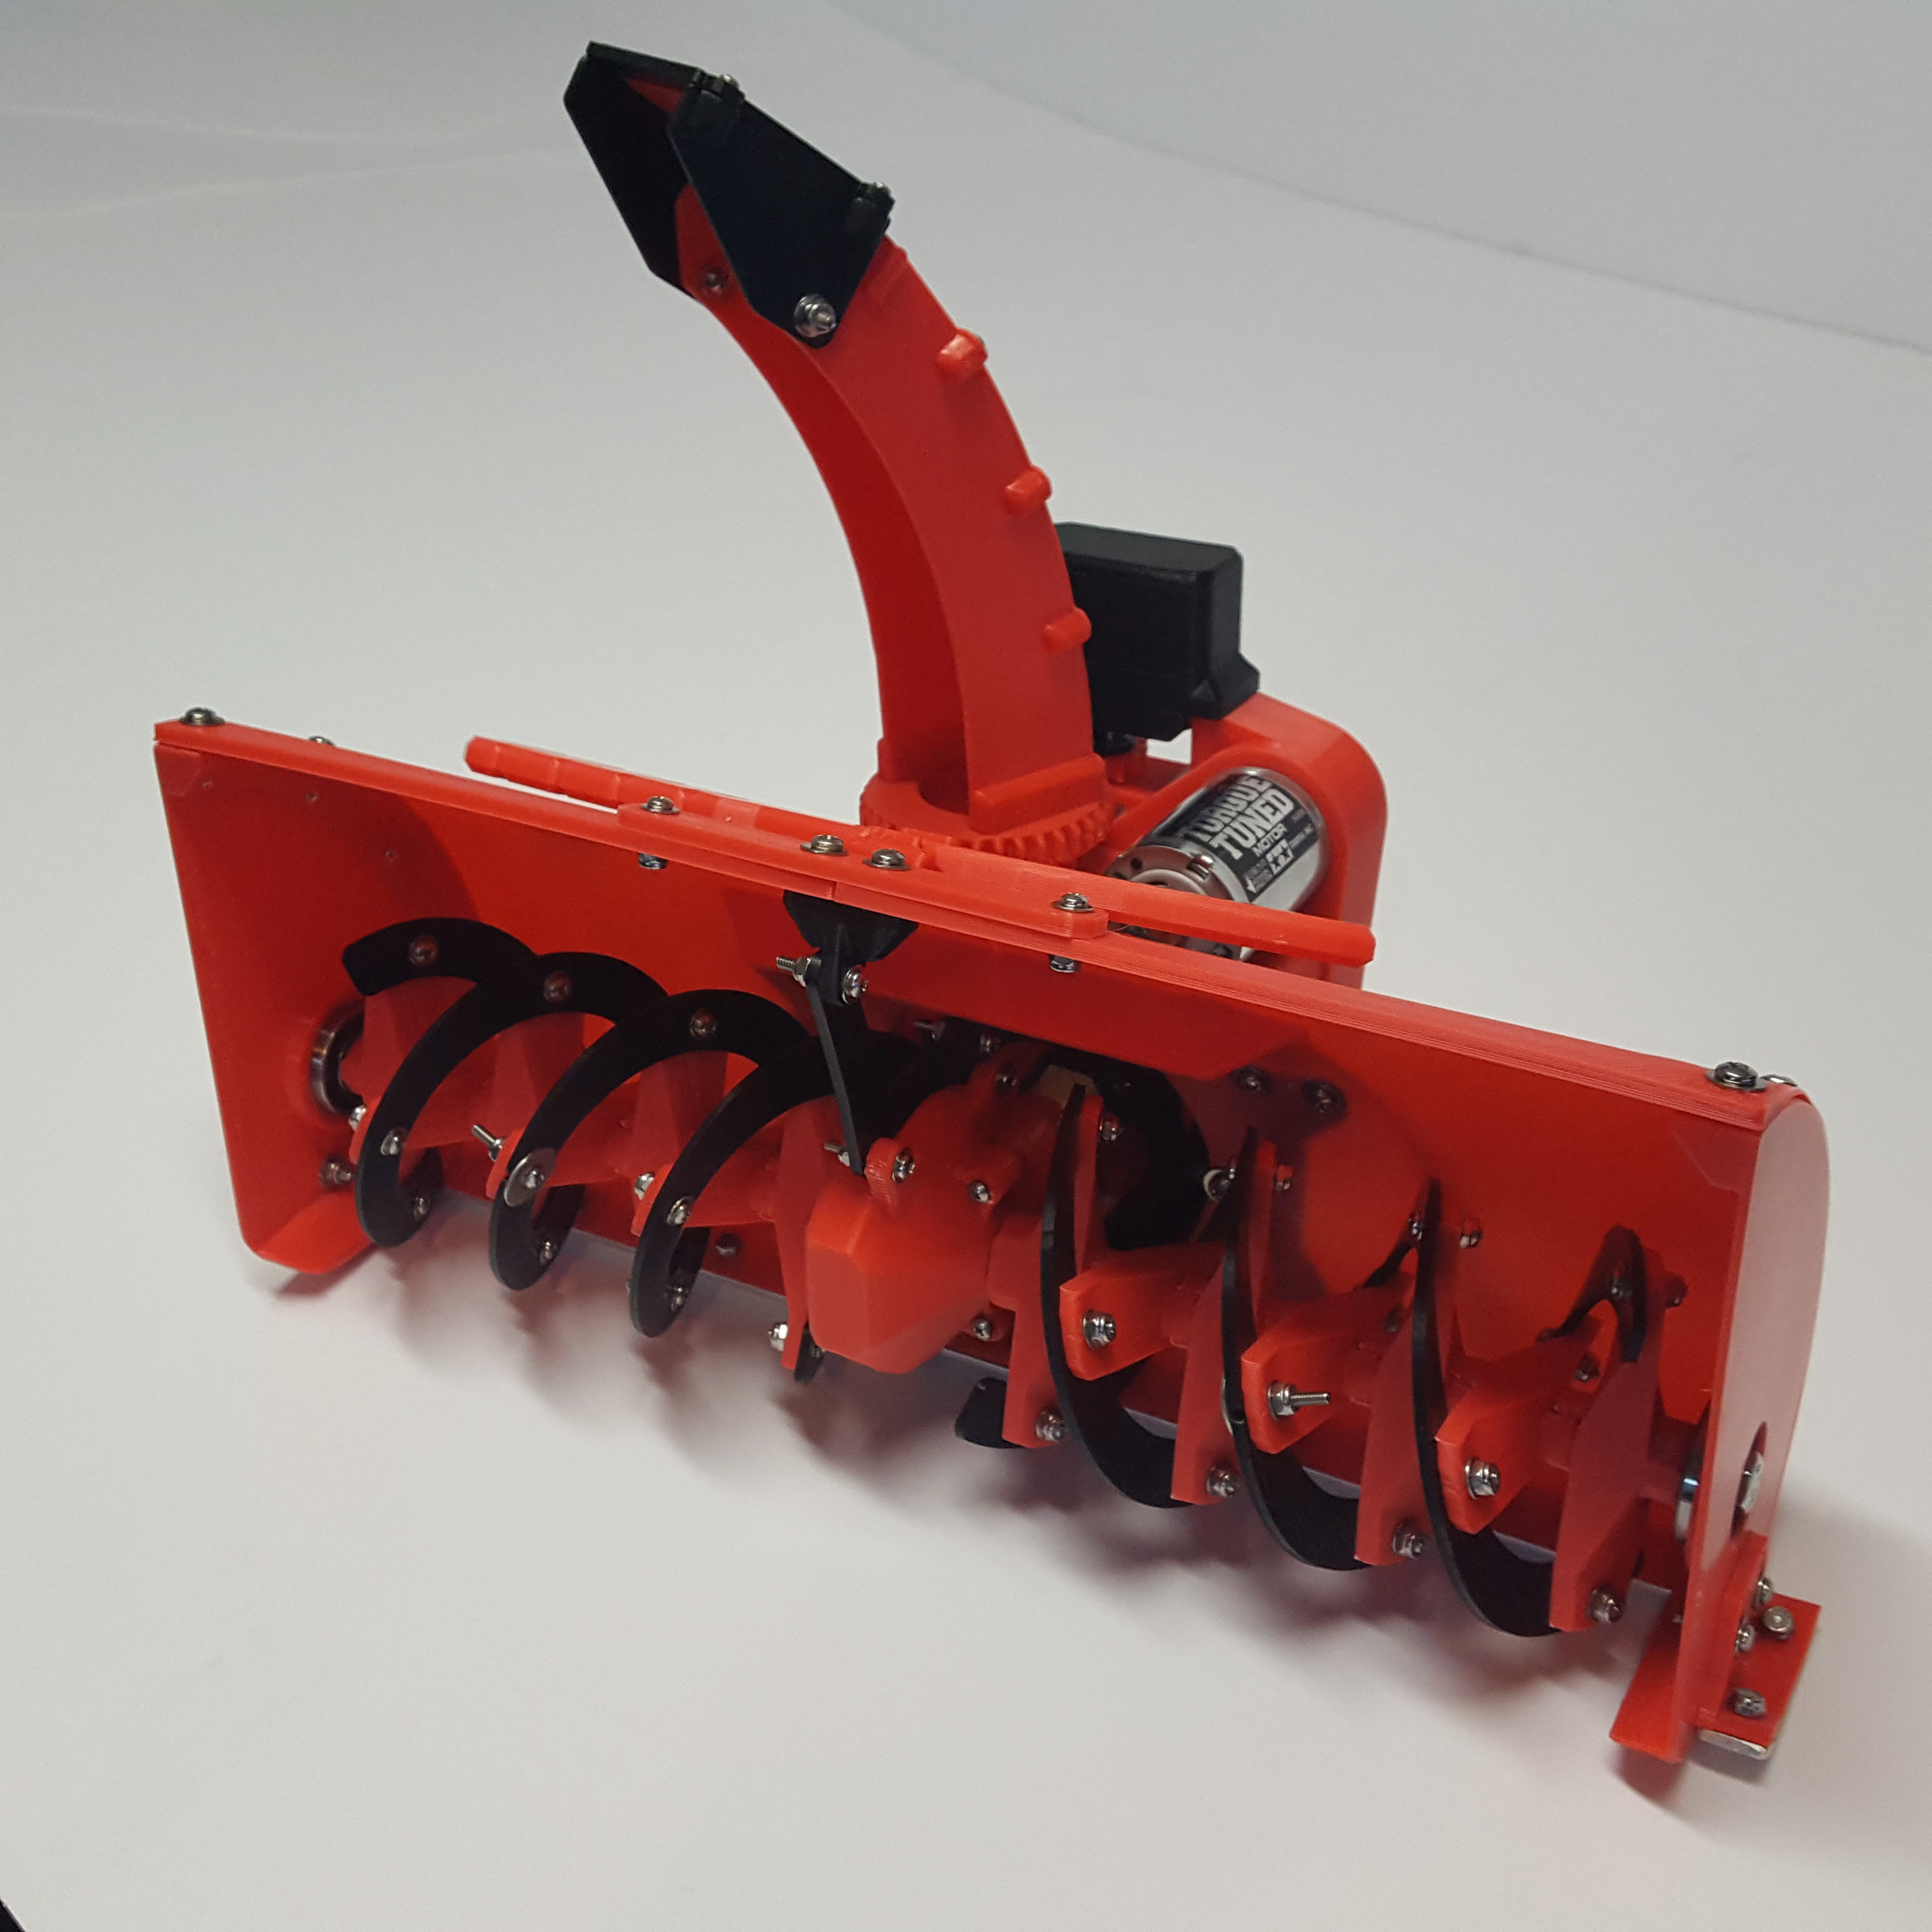 snow blower artr v3 spyker workshop